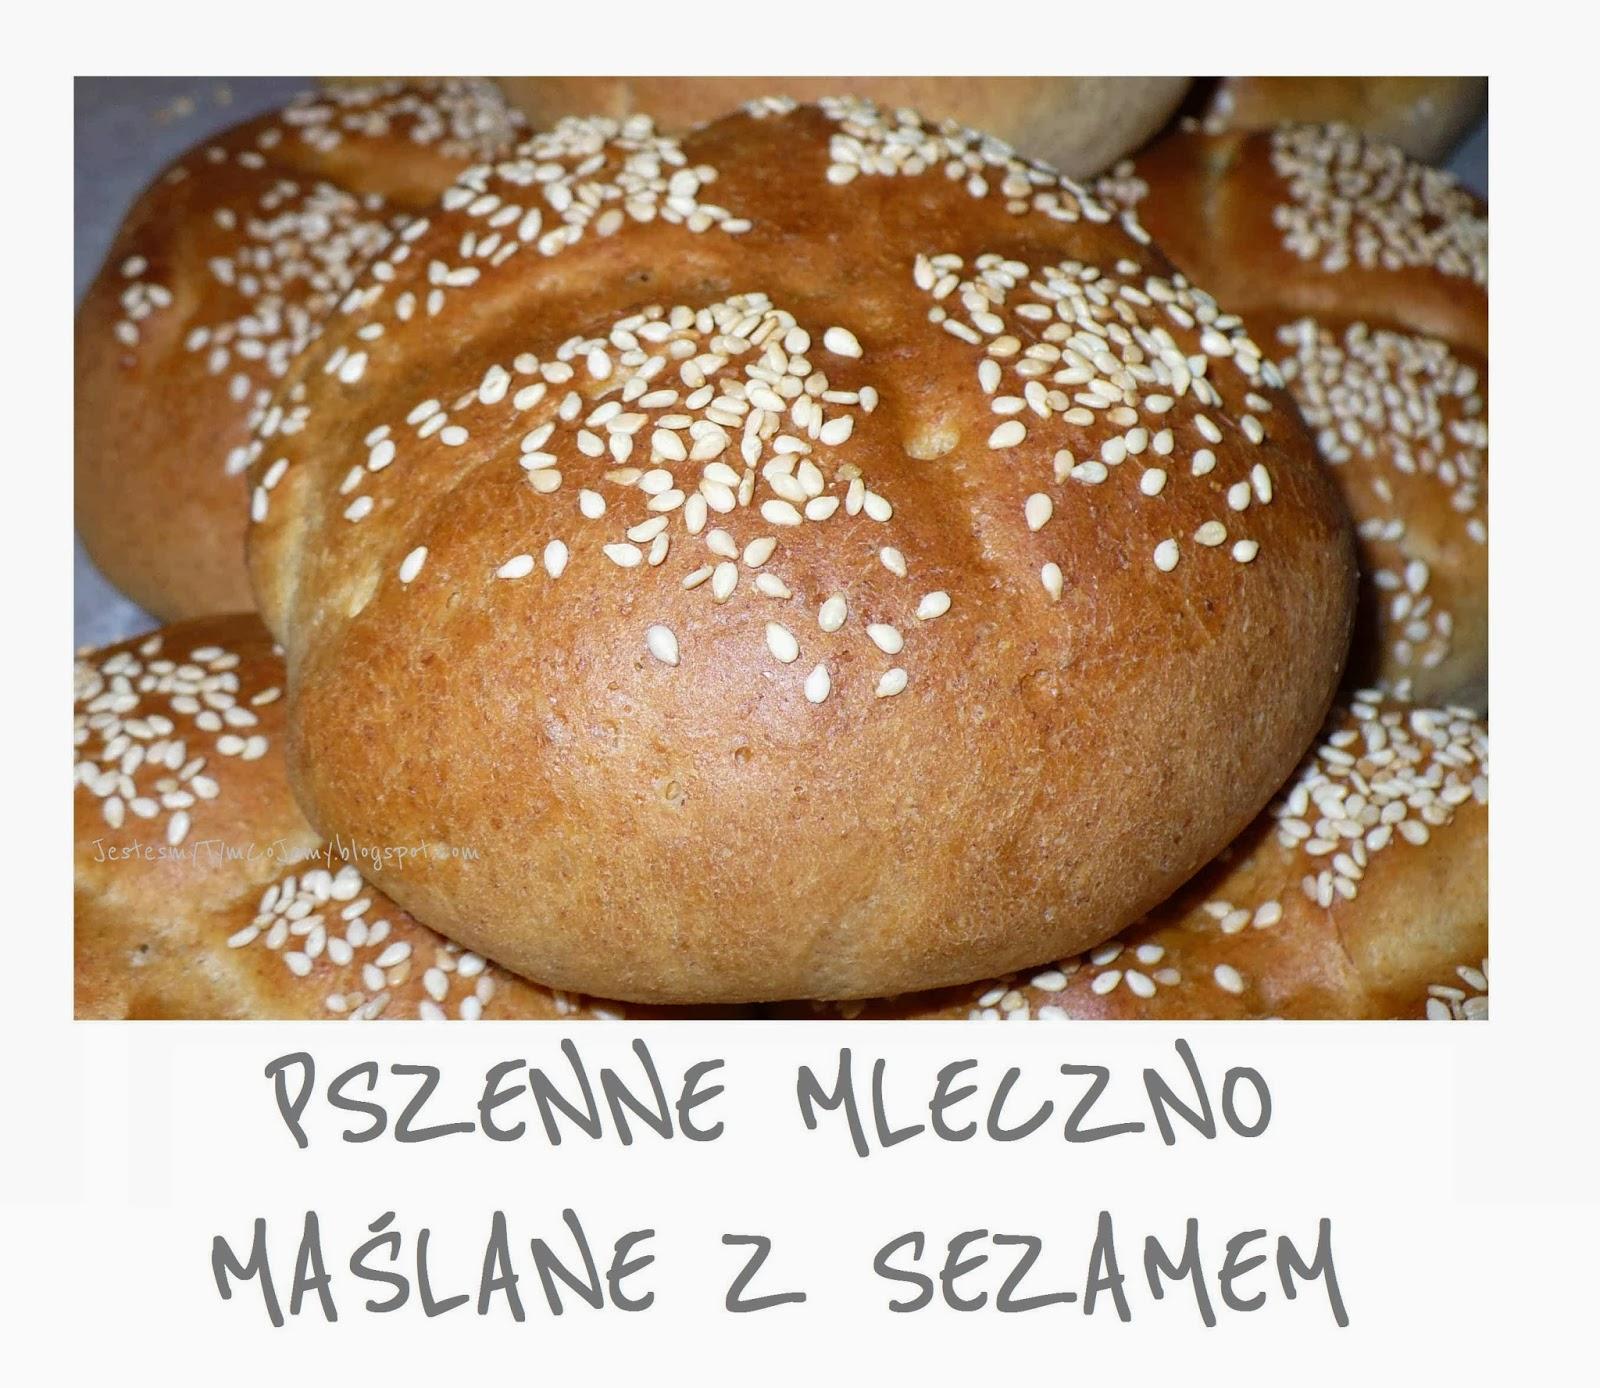 http://jestesmytymcojemy.blogspot.com/2013/03/penoziarniste-maslane-bueczki.html